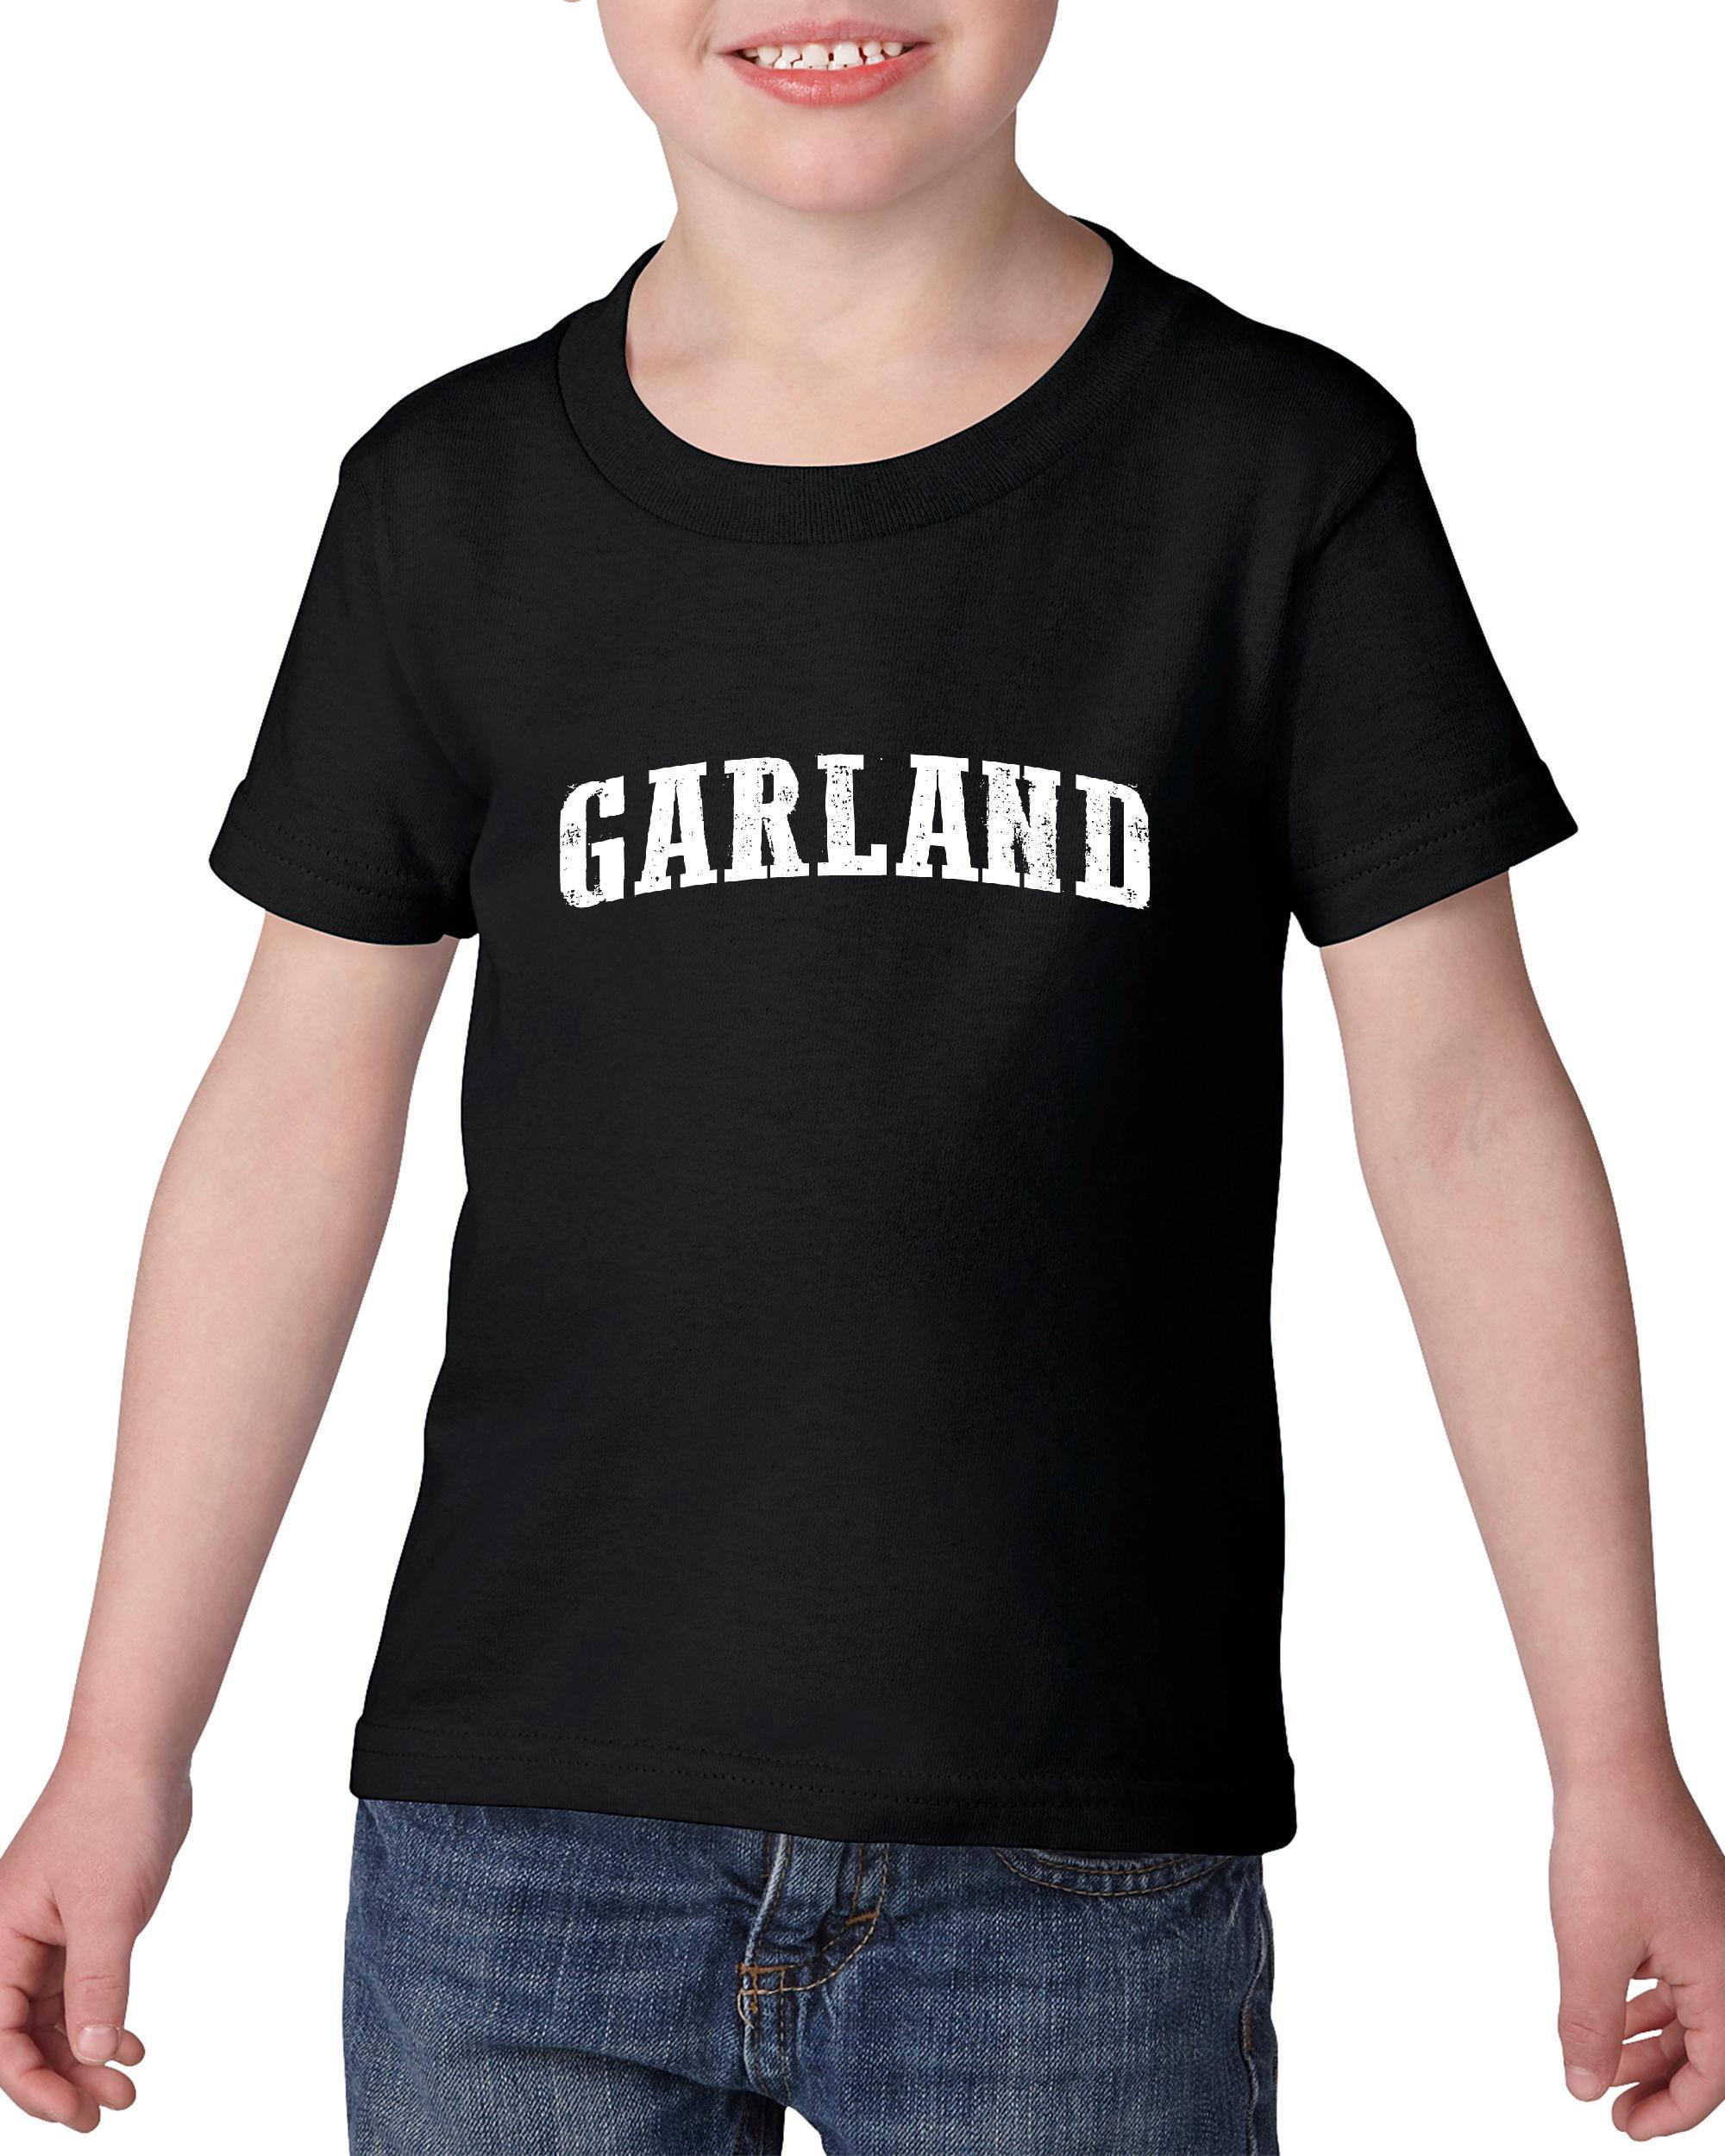 Artix Garland TX Texas Flag Houston Map Longhorns Bobcats Home Texas State University Heavy Cotton Toddler Kids T-Shirt Tee Clothing